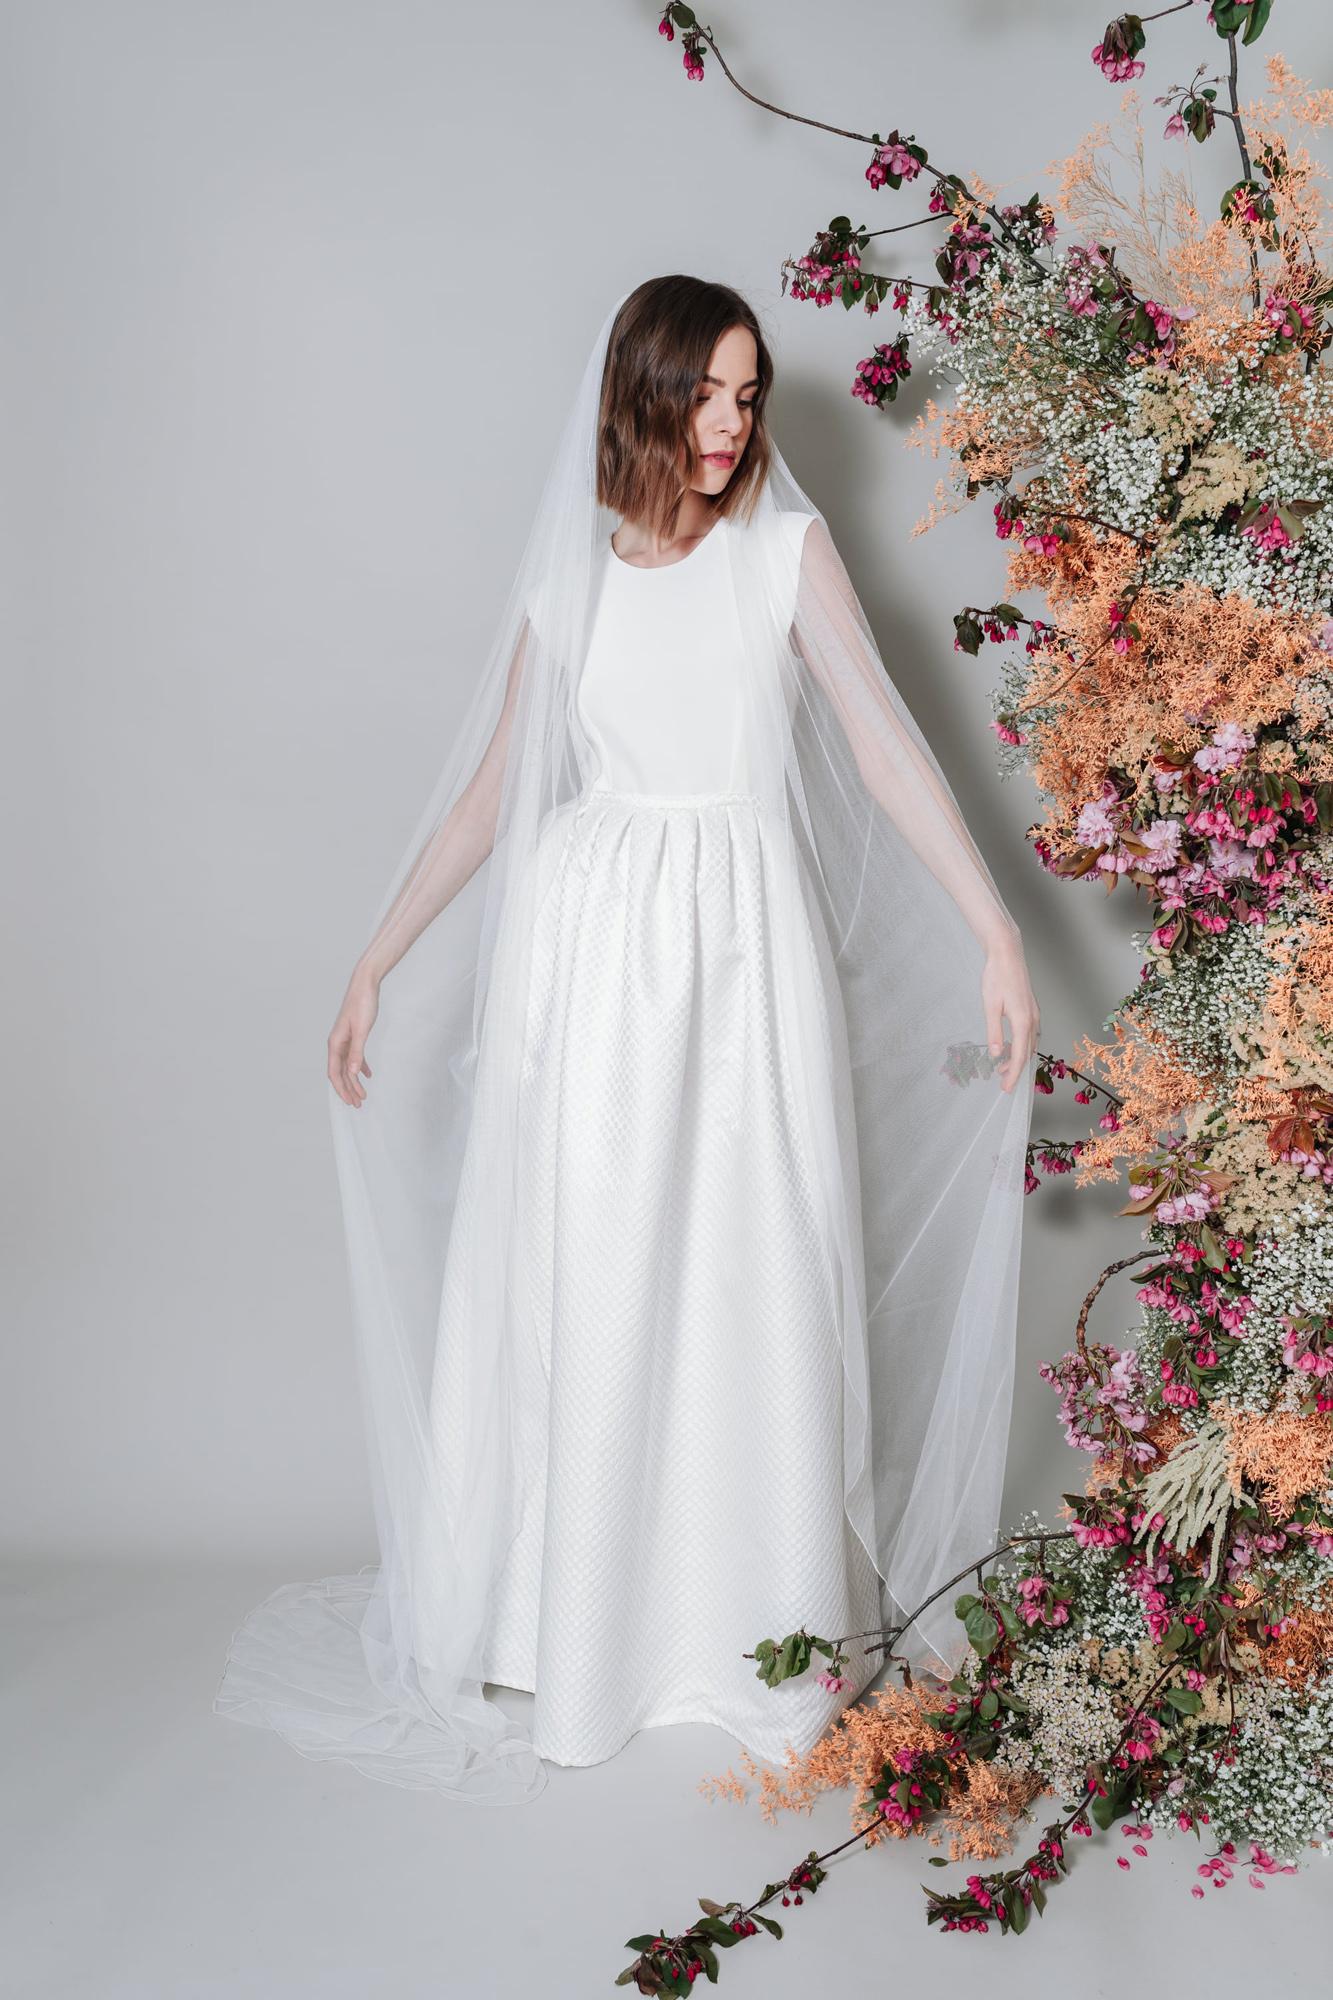 Kate-Beaumont-Sheffield-Zinnia-Modern-Wedding-Gown-Polka-Dot-Pleated-Skirt-13.jpg